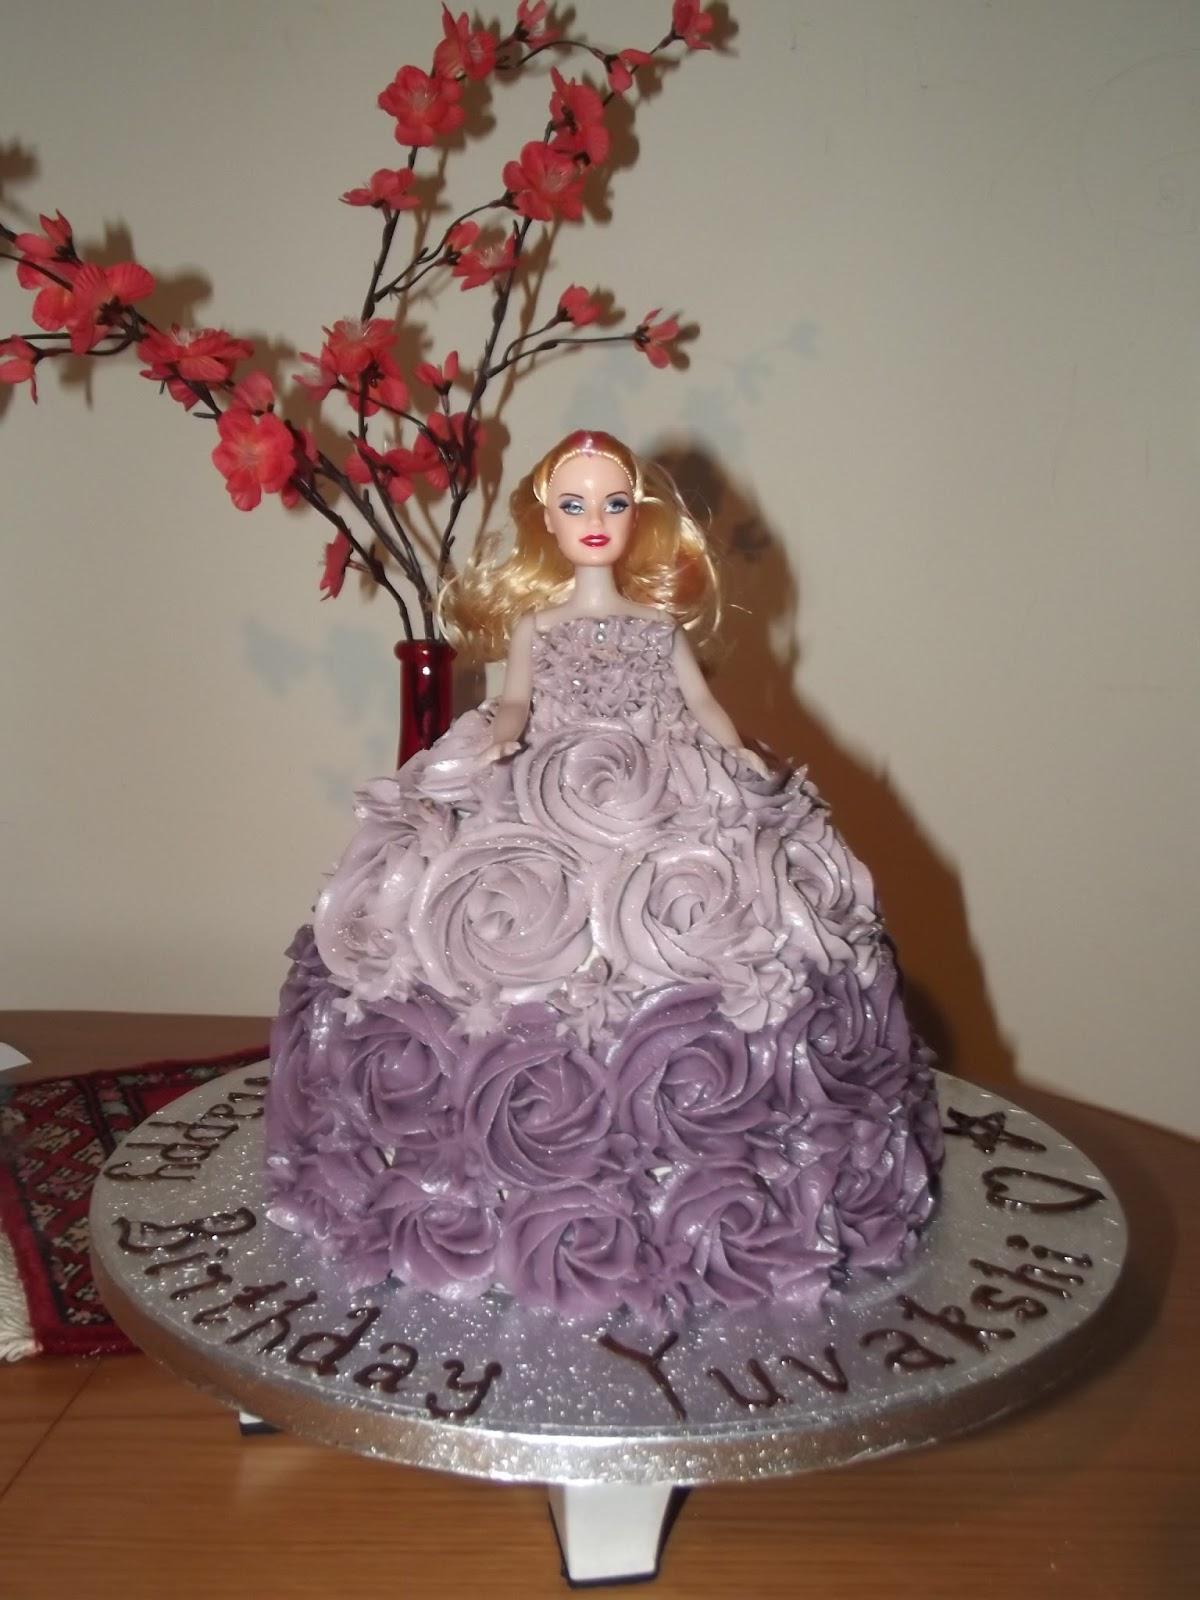 Doll Cake Buttercream Style of Doll Cake Before